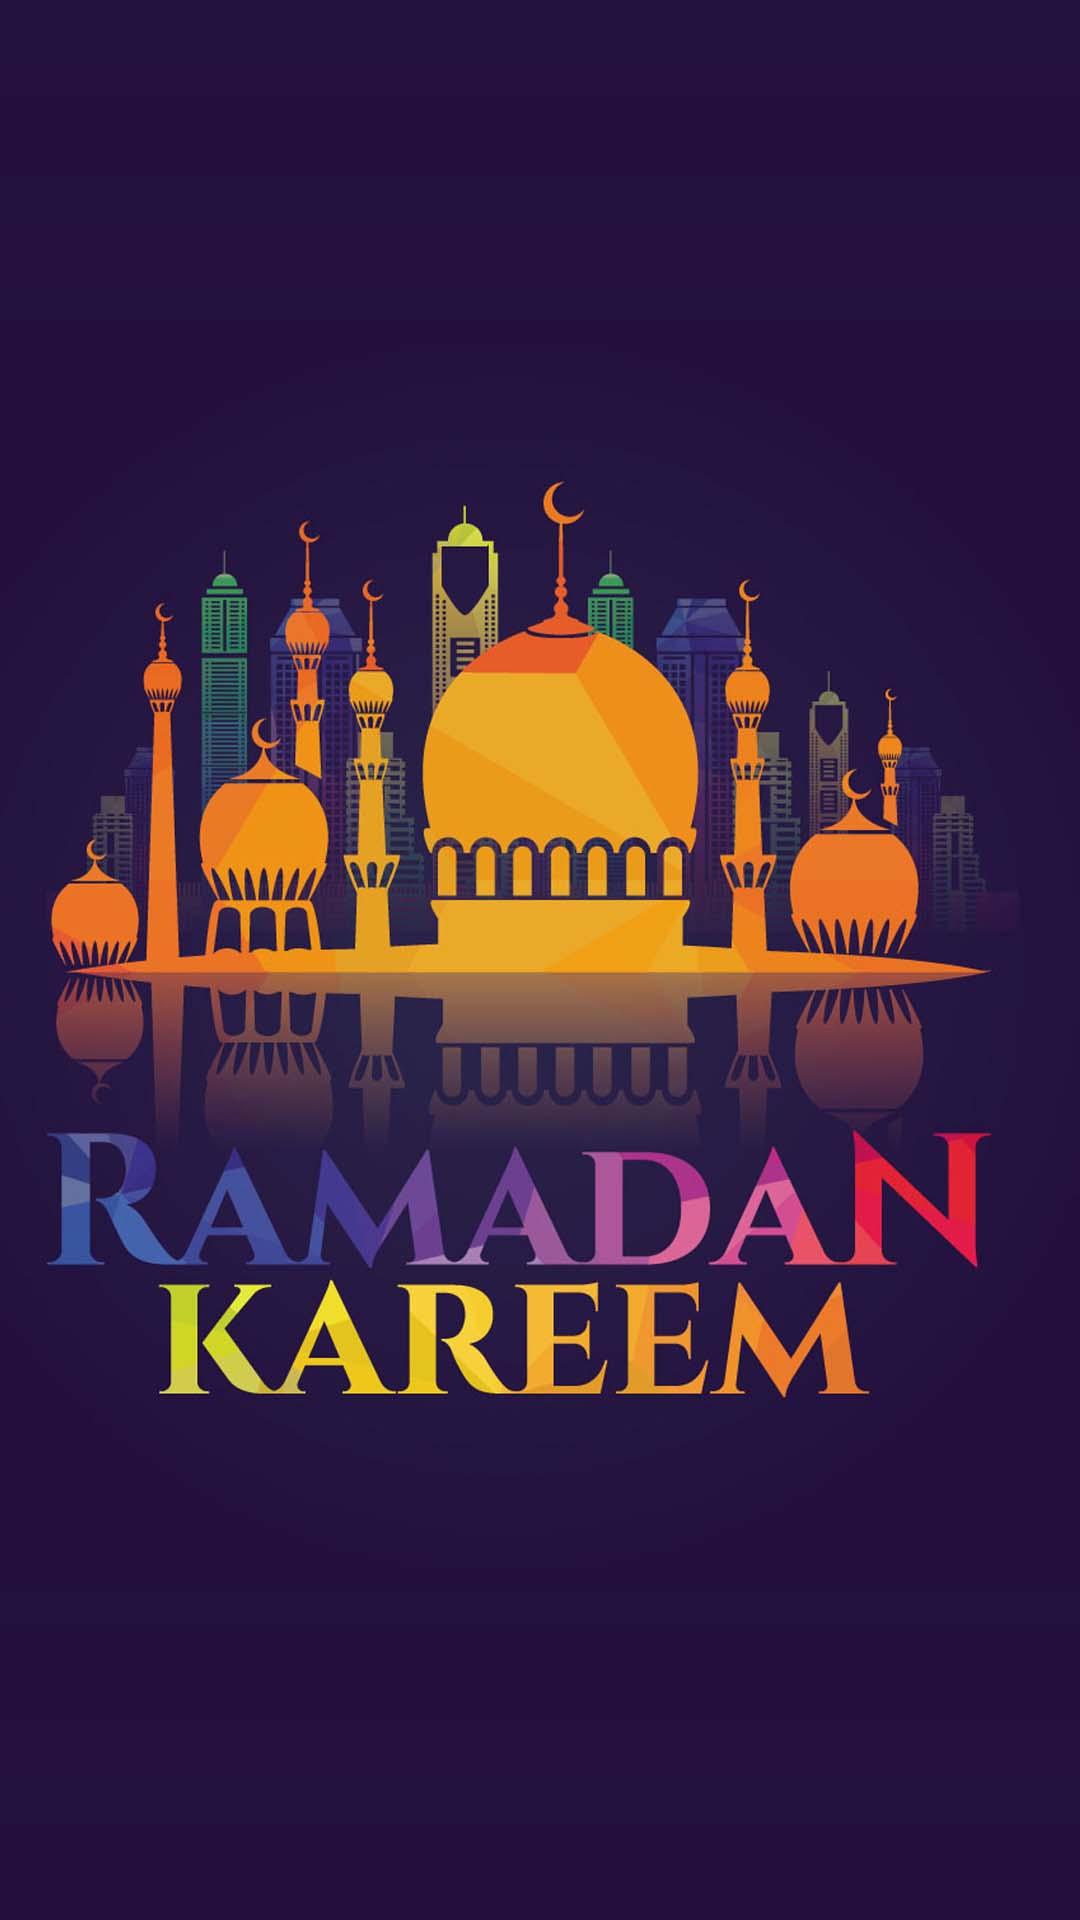 Pubg Hd Wallpaper For Mobile خلفيات موبايل رمضان كريم Mobile Wallpapers Hd جرافيك مان